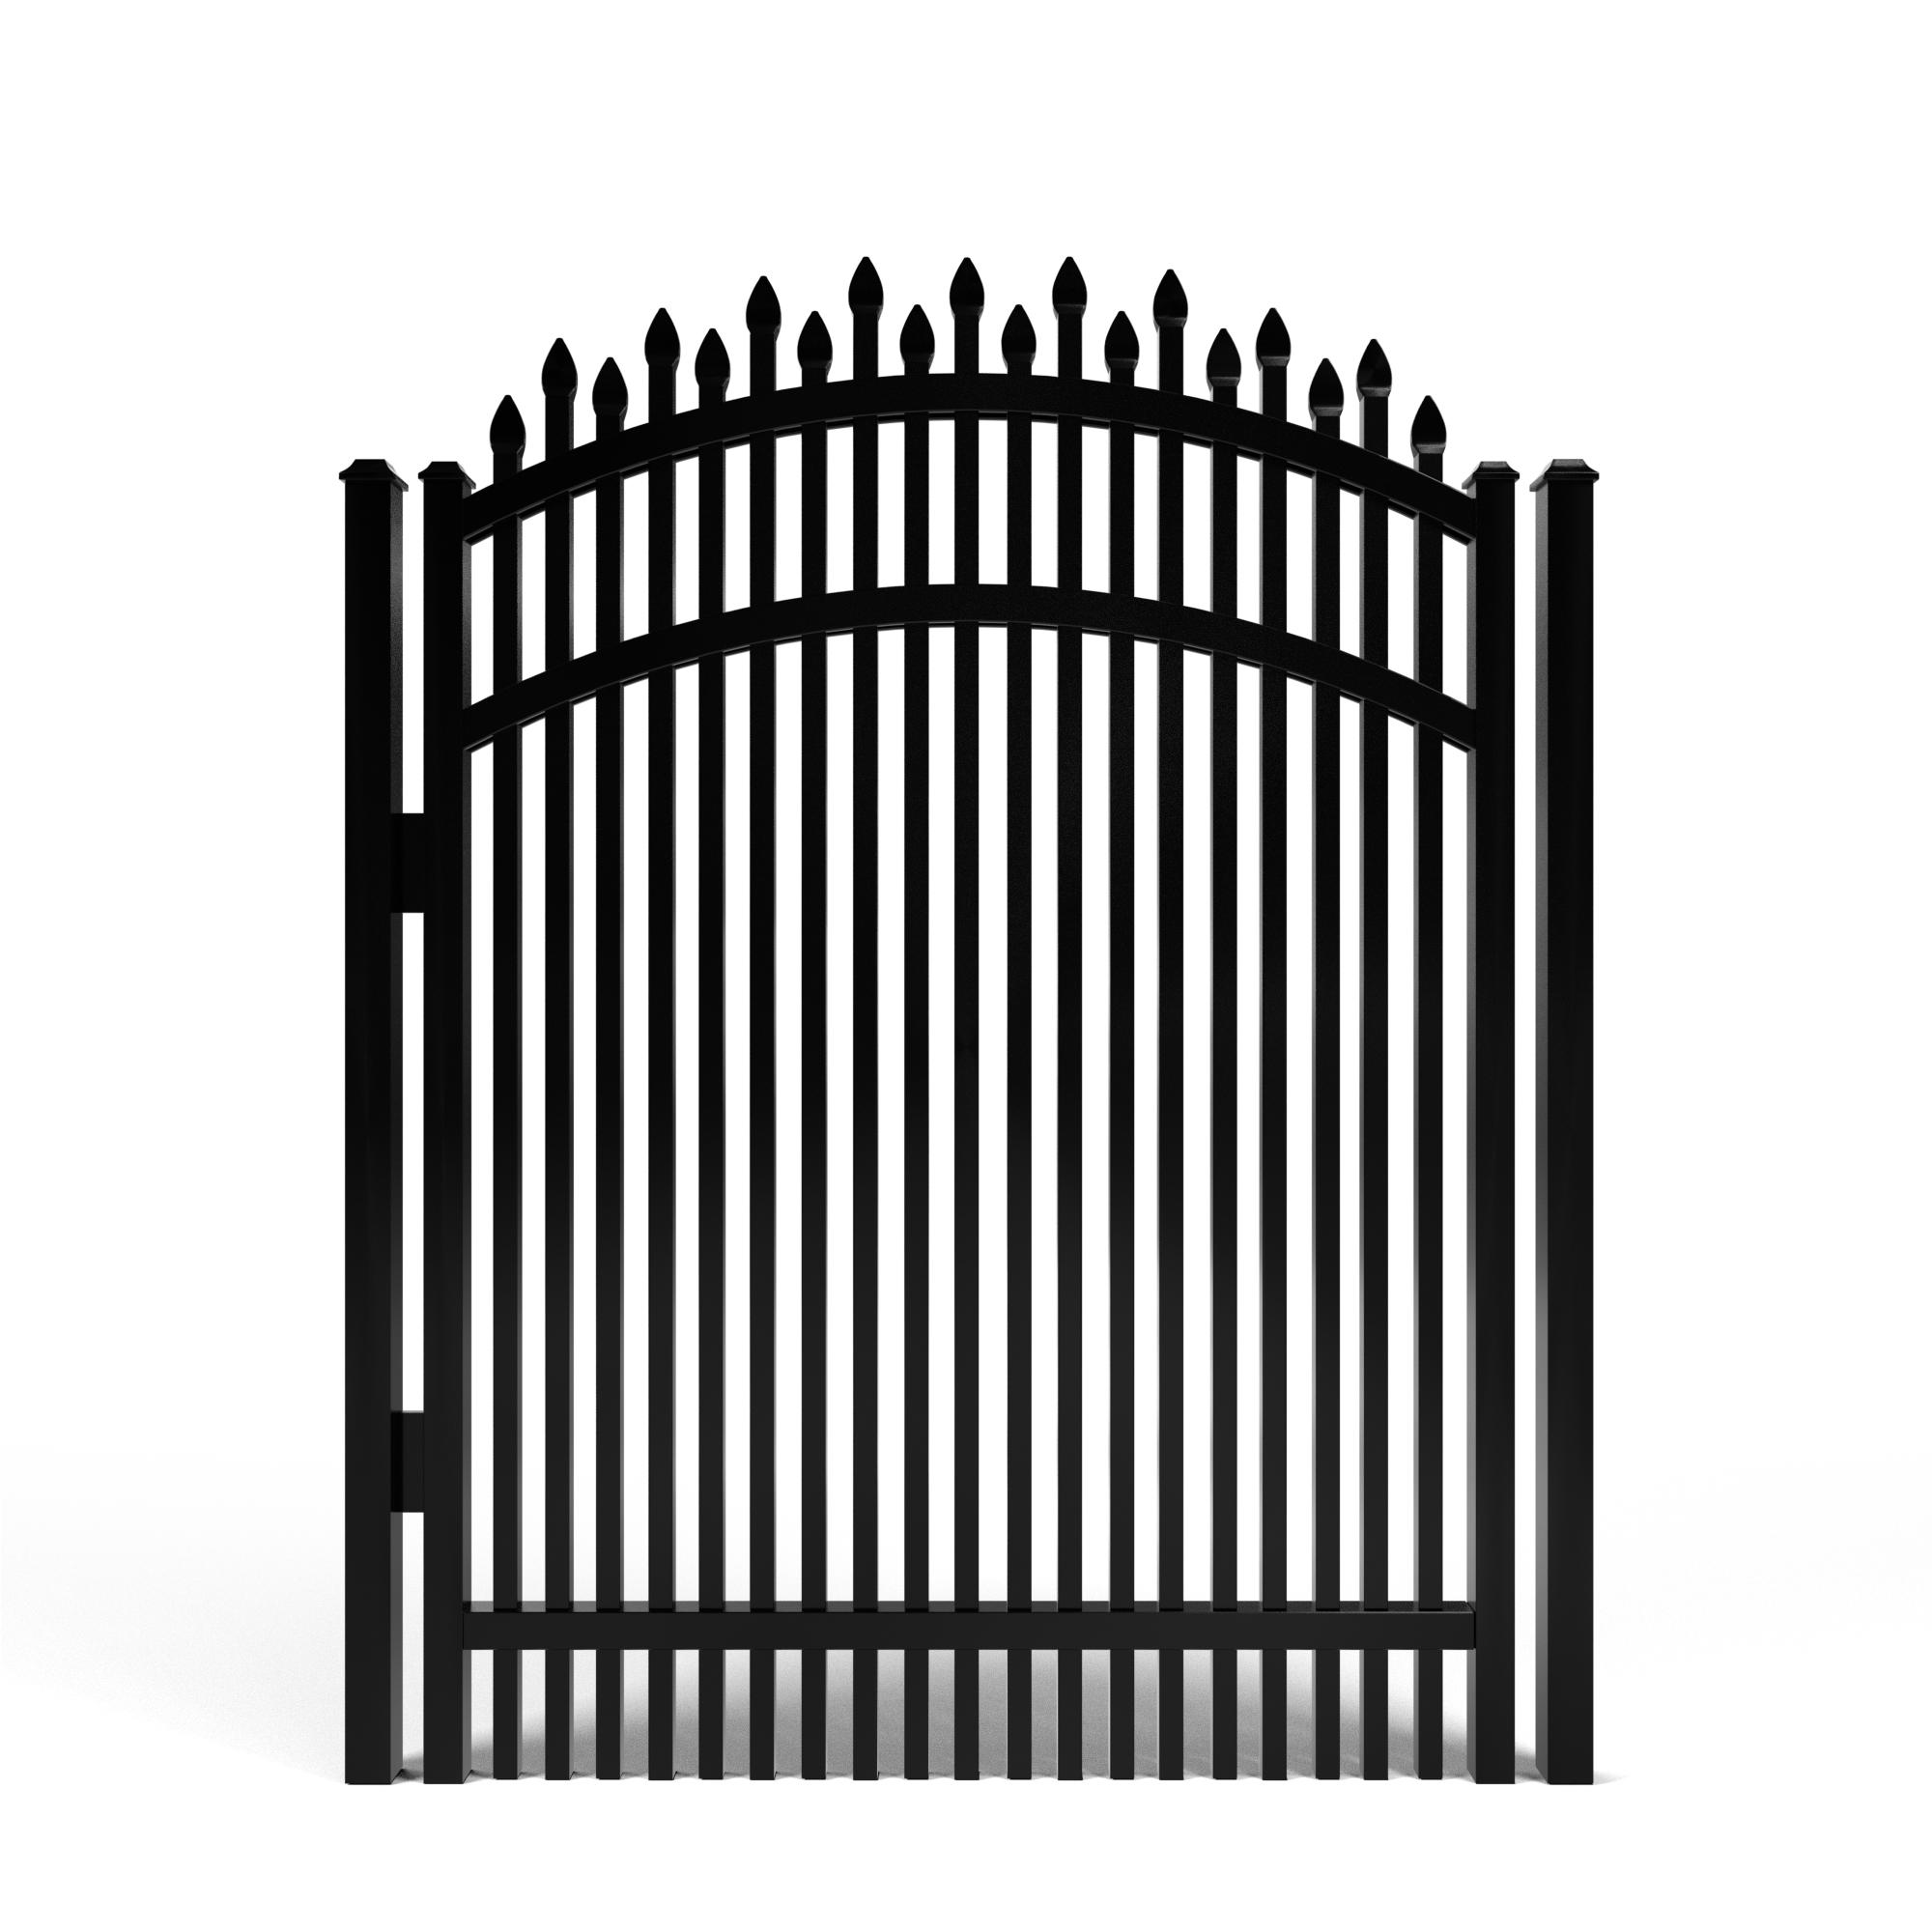 Dunwoody Alternating Spear Double-Spaced Aluminum Walk Gate